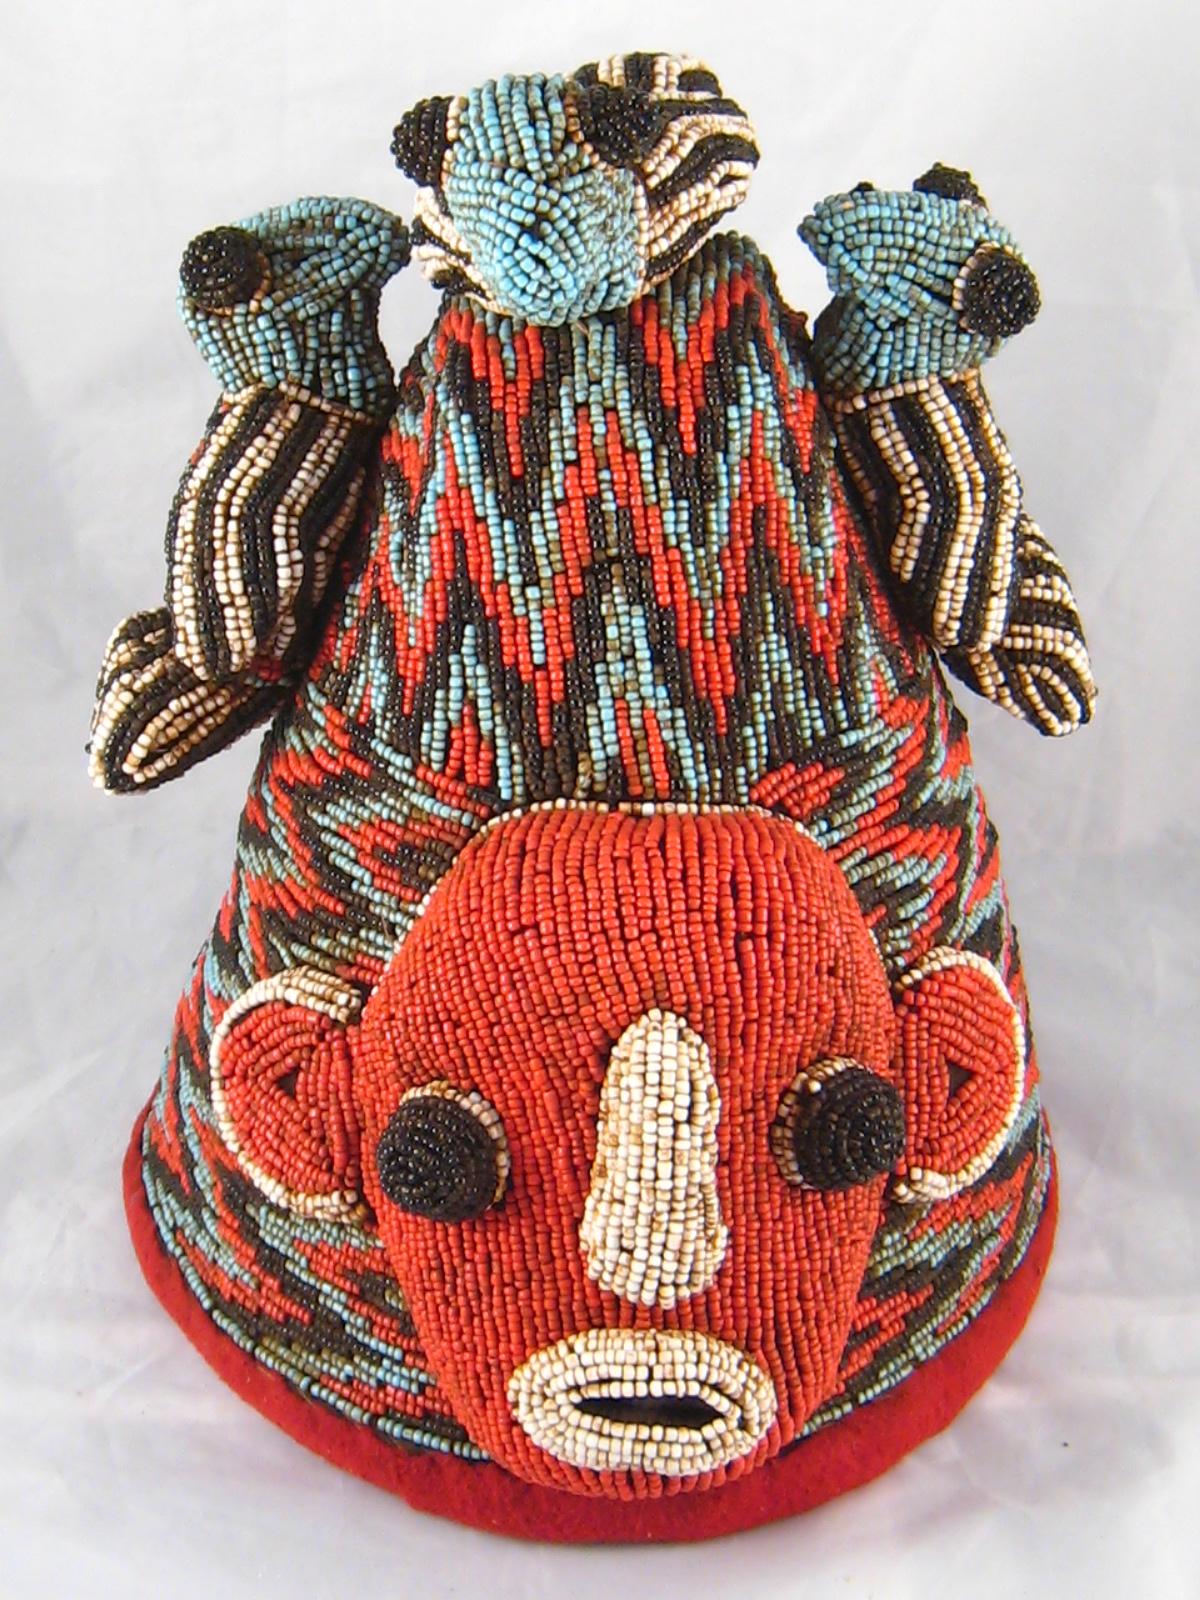 Lot 426 - Tribal Art . A Yoruba beaded hat adorned with three birds, Nigeria. Ht. 33cm.